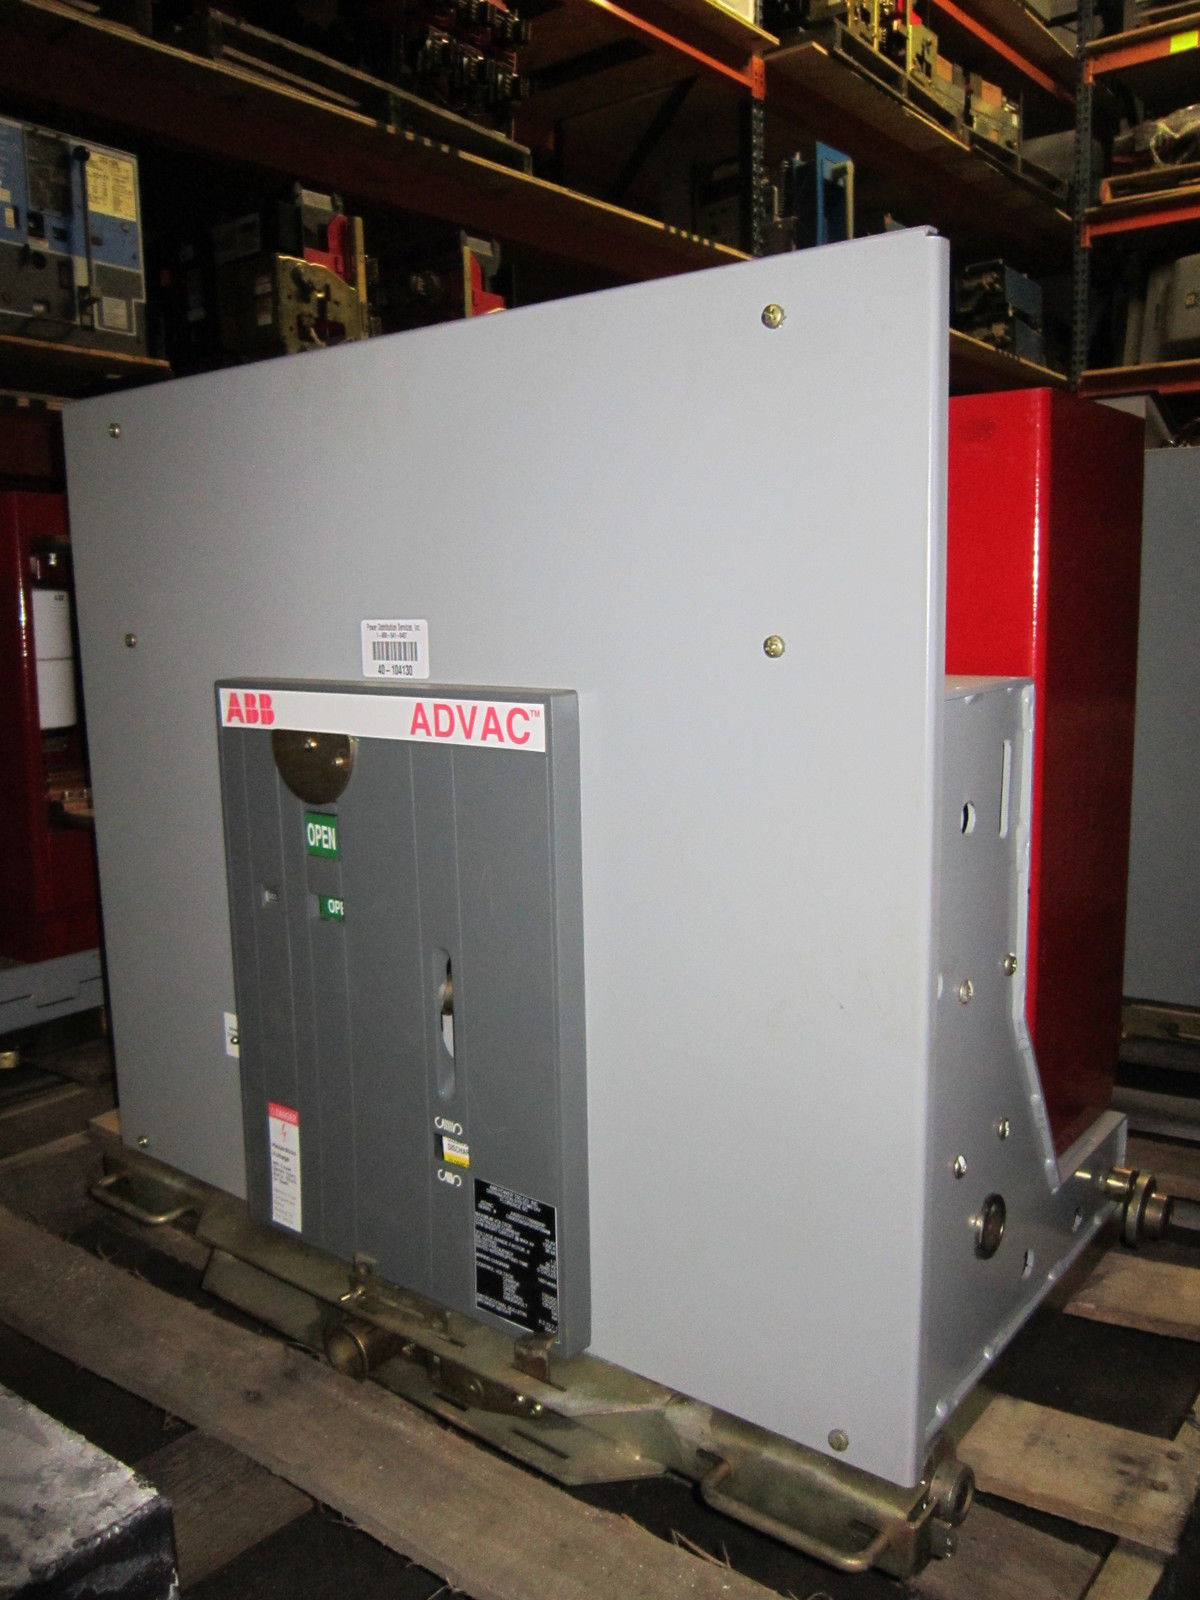 Abb advac kv a aa p vacuum circuit